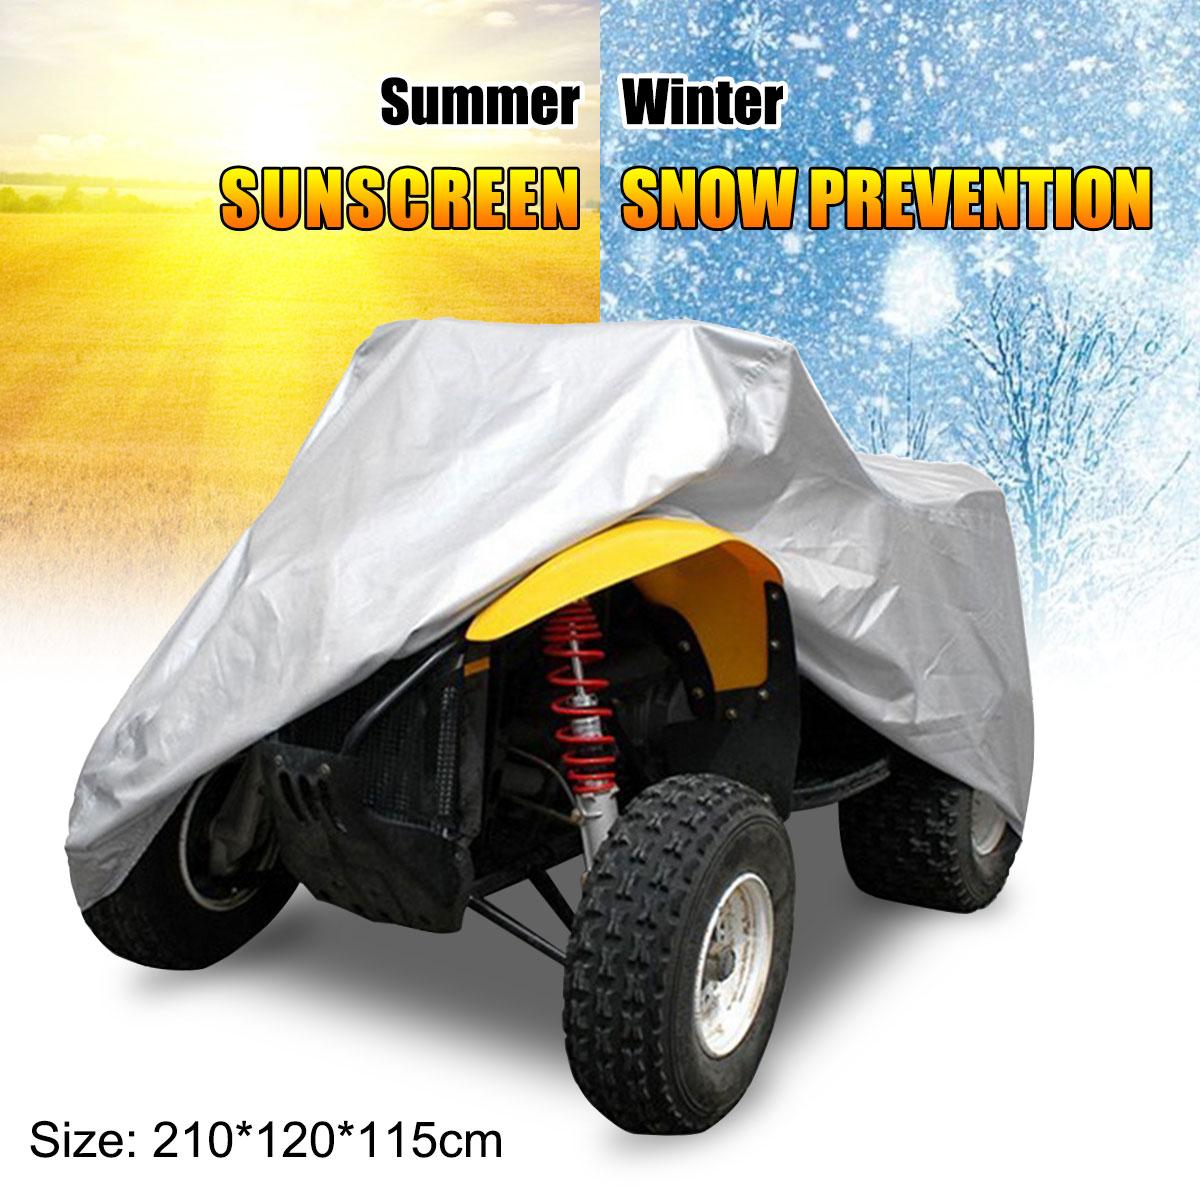 XL Large 190T Quad Bike Tractor ATV Cover Anti UV Rain Waterproof Heatproof Lawn Mower ATV Car Cover + Storage Bag 210x120x115cm